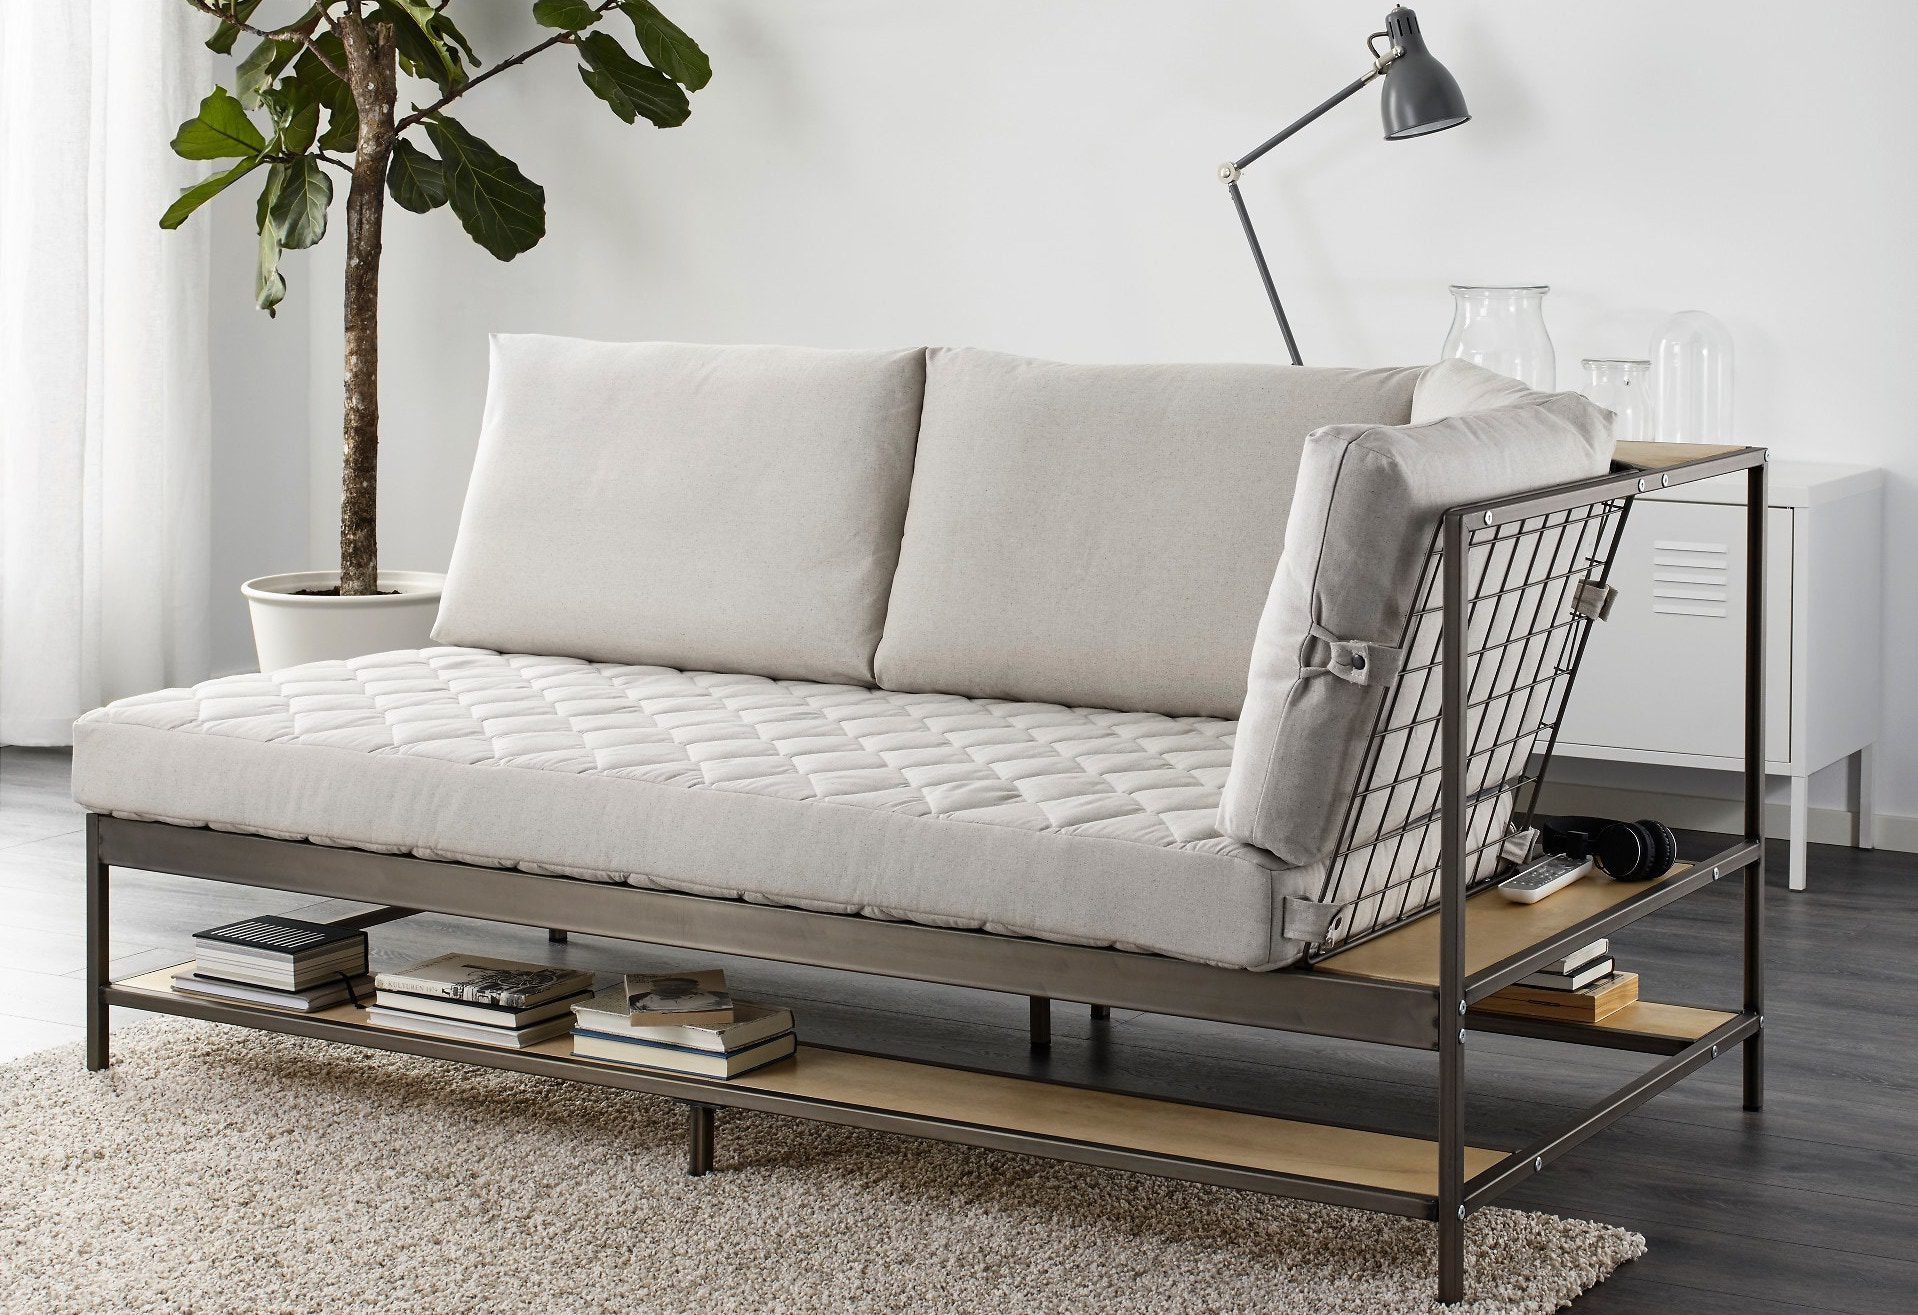 IKEA Ekebol Sofa Review